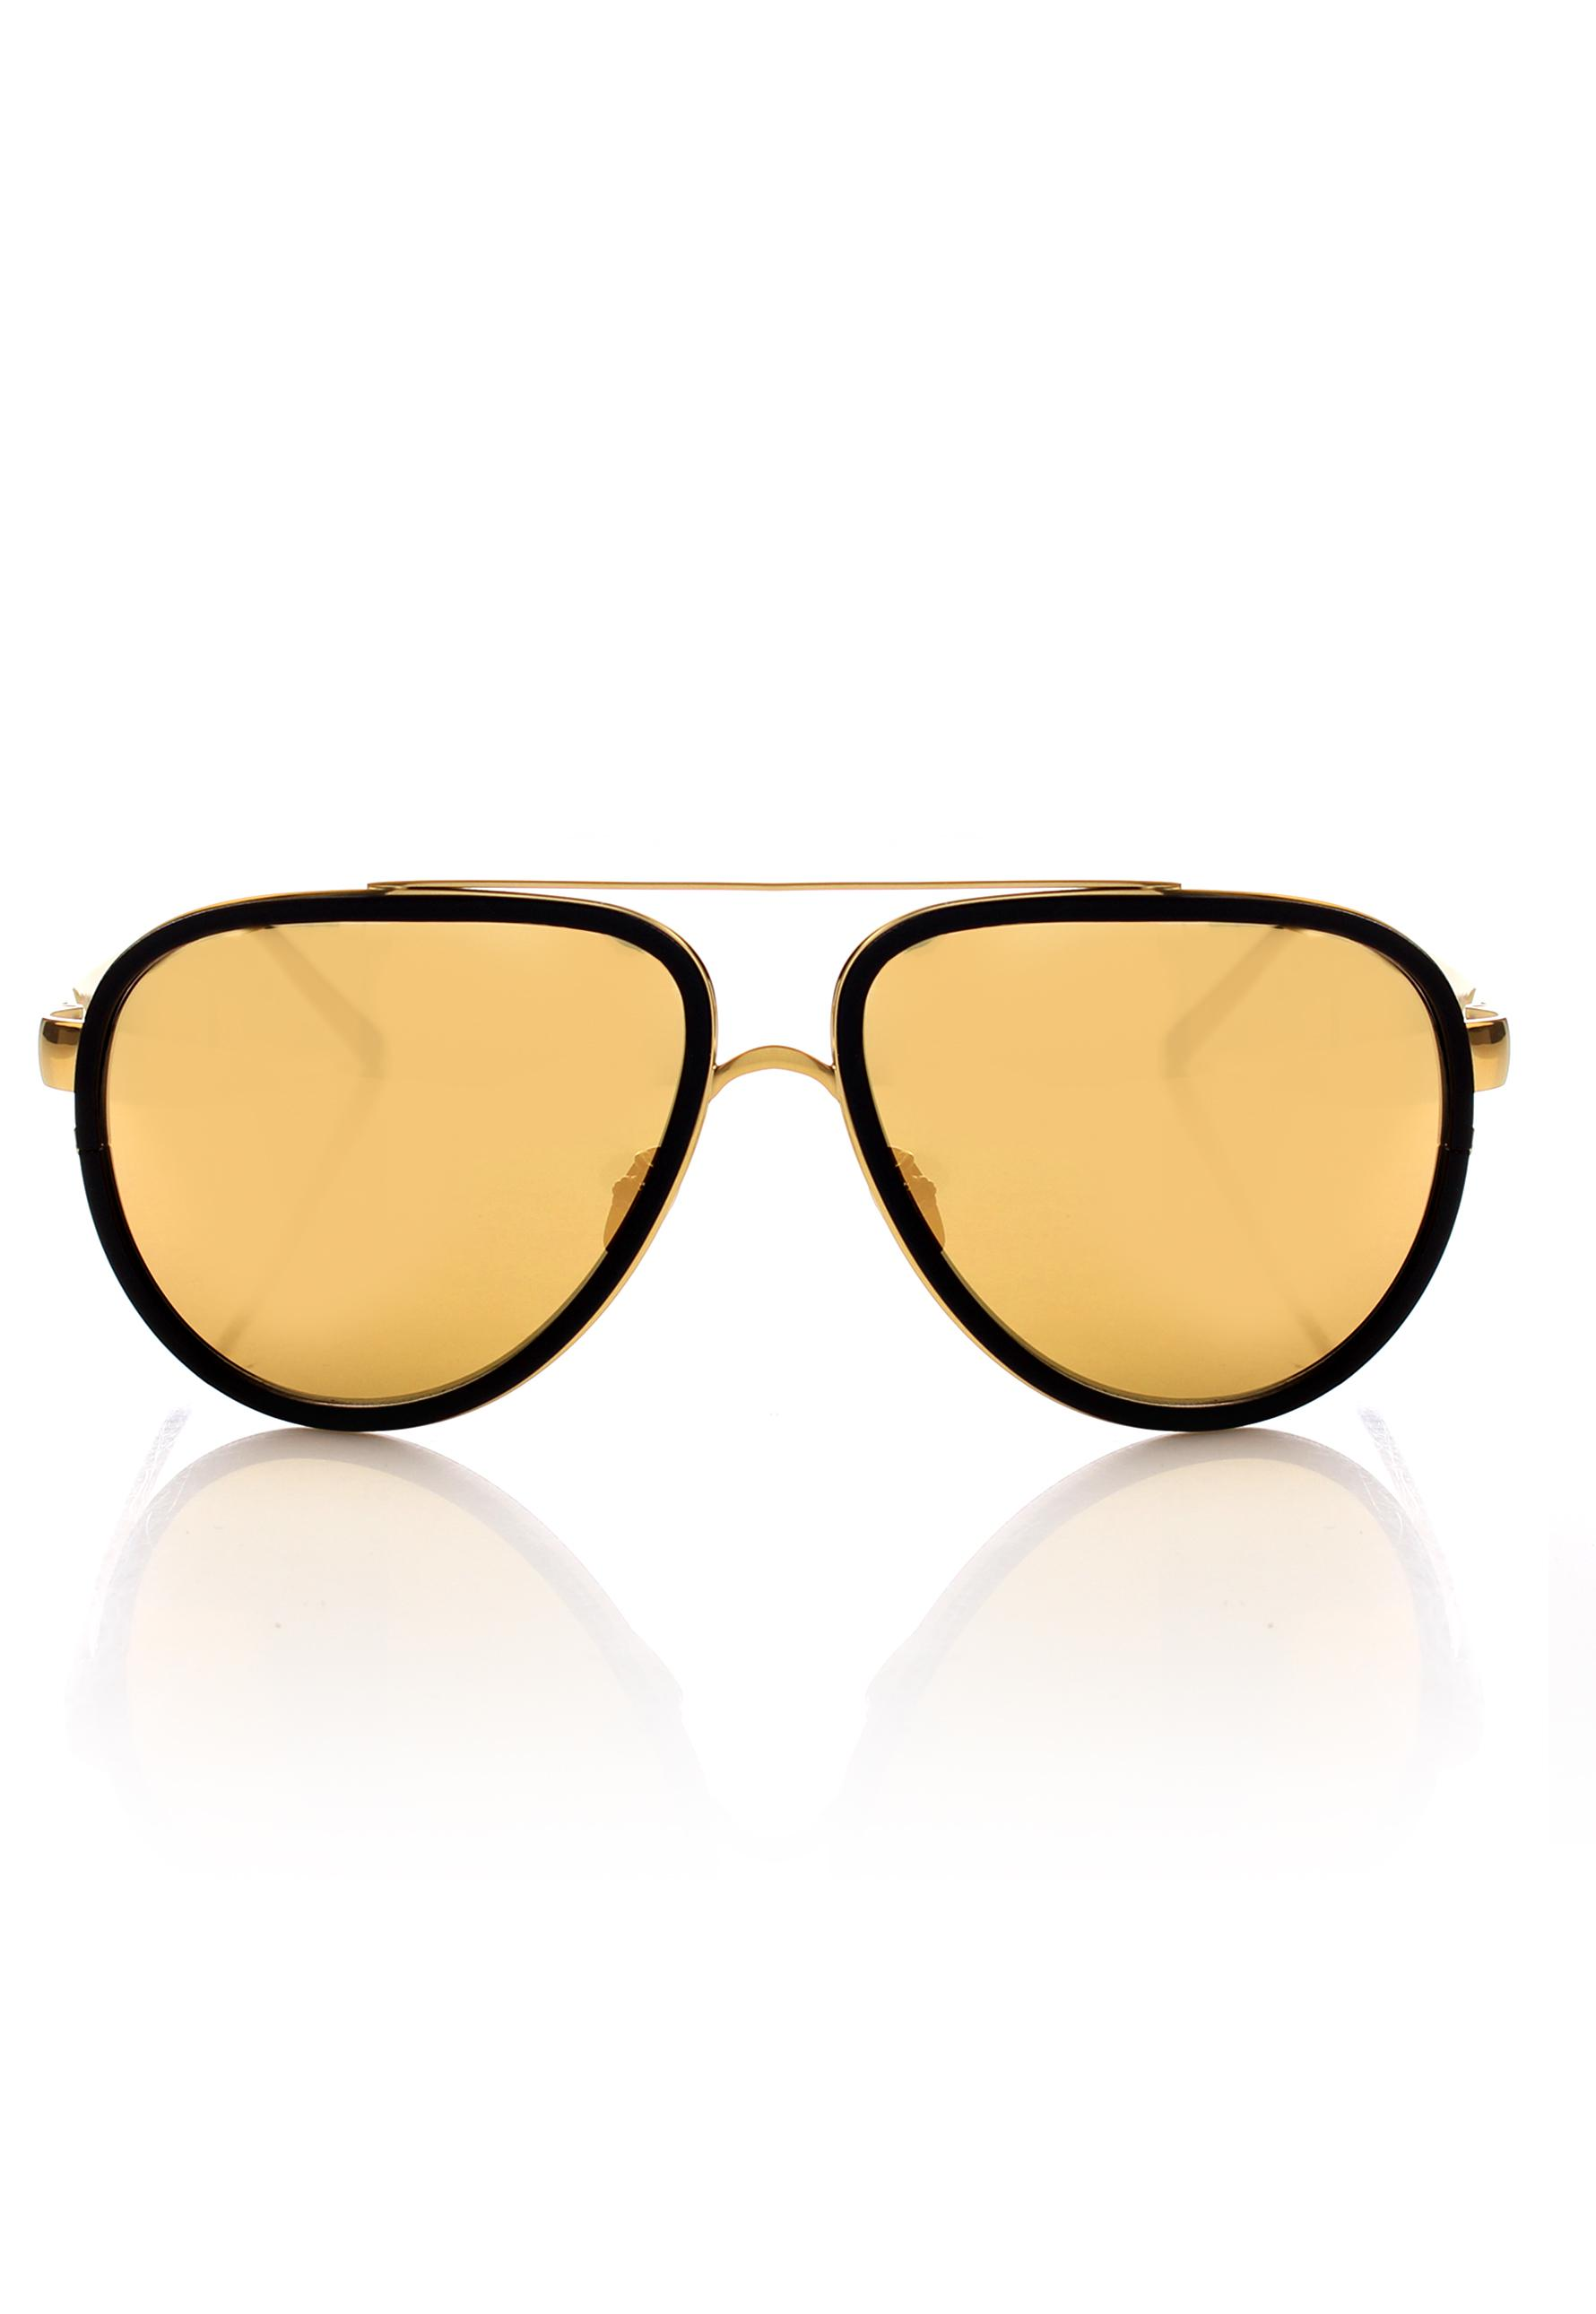 ea3806e38a7a Linda Farrow. Women s 22 Karat Gold Aviator 441 Sunglasses Black Aluminium  gold